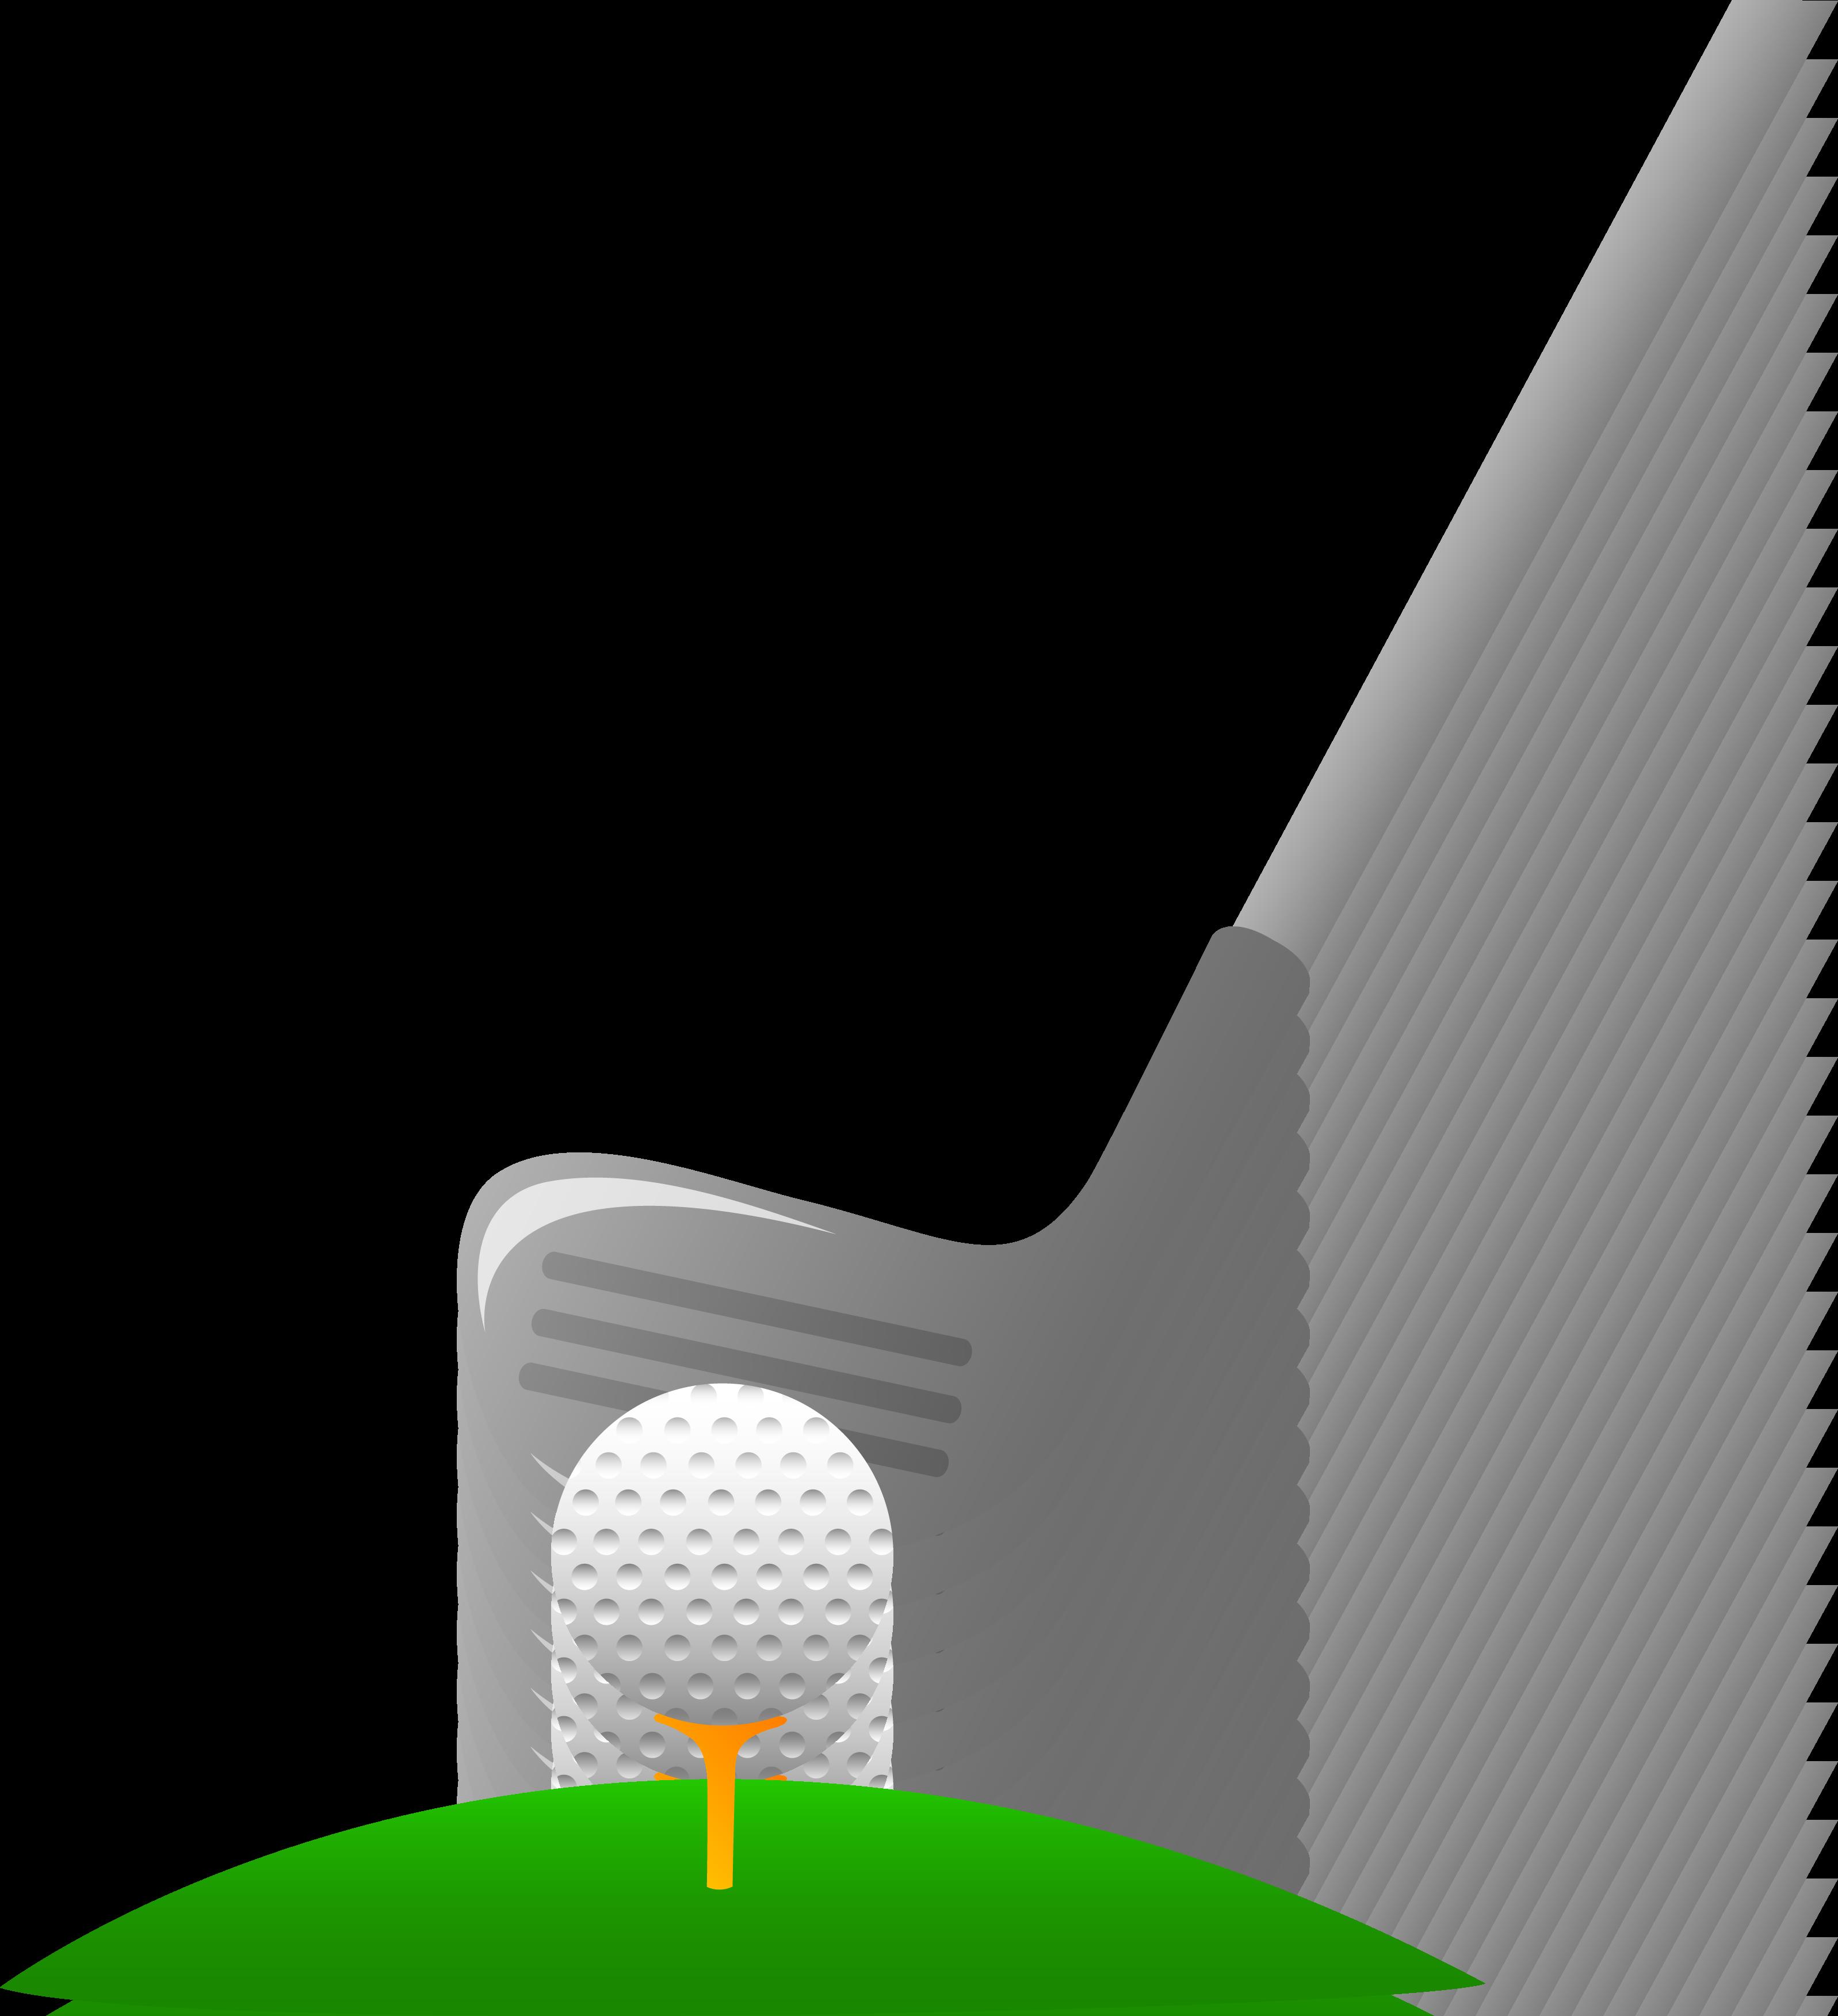 Golf Ball Clipart Free. 0ece9bb1a9b54f3e-Golf Ball Clipart Free. 0ece9bb1a9b54f3e8a2723f5b90fb2 .-9